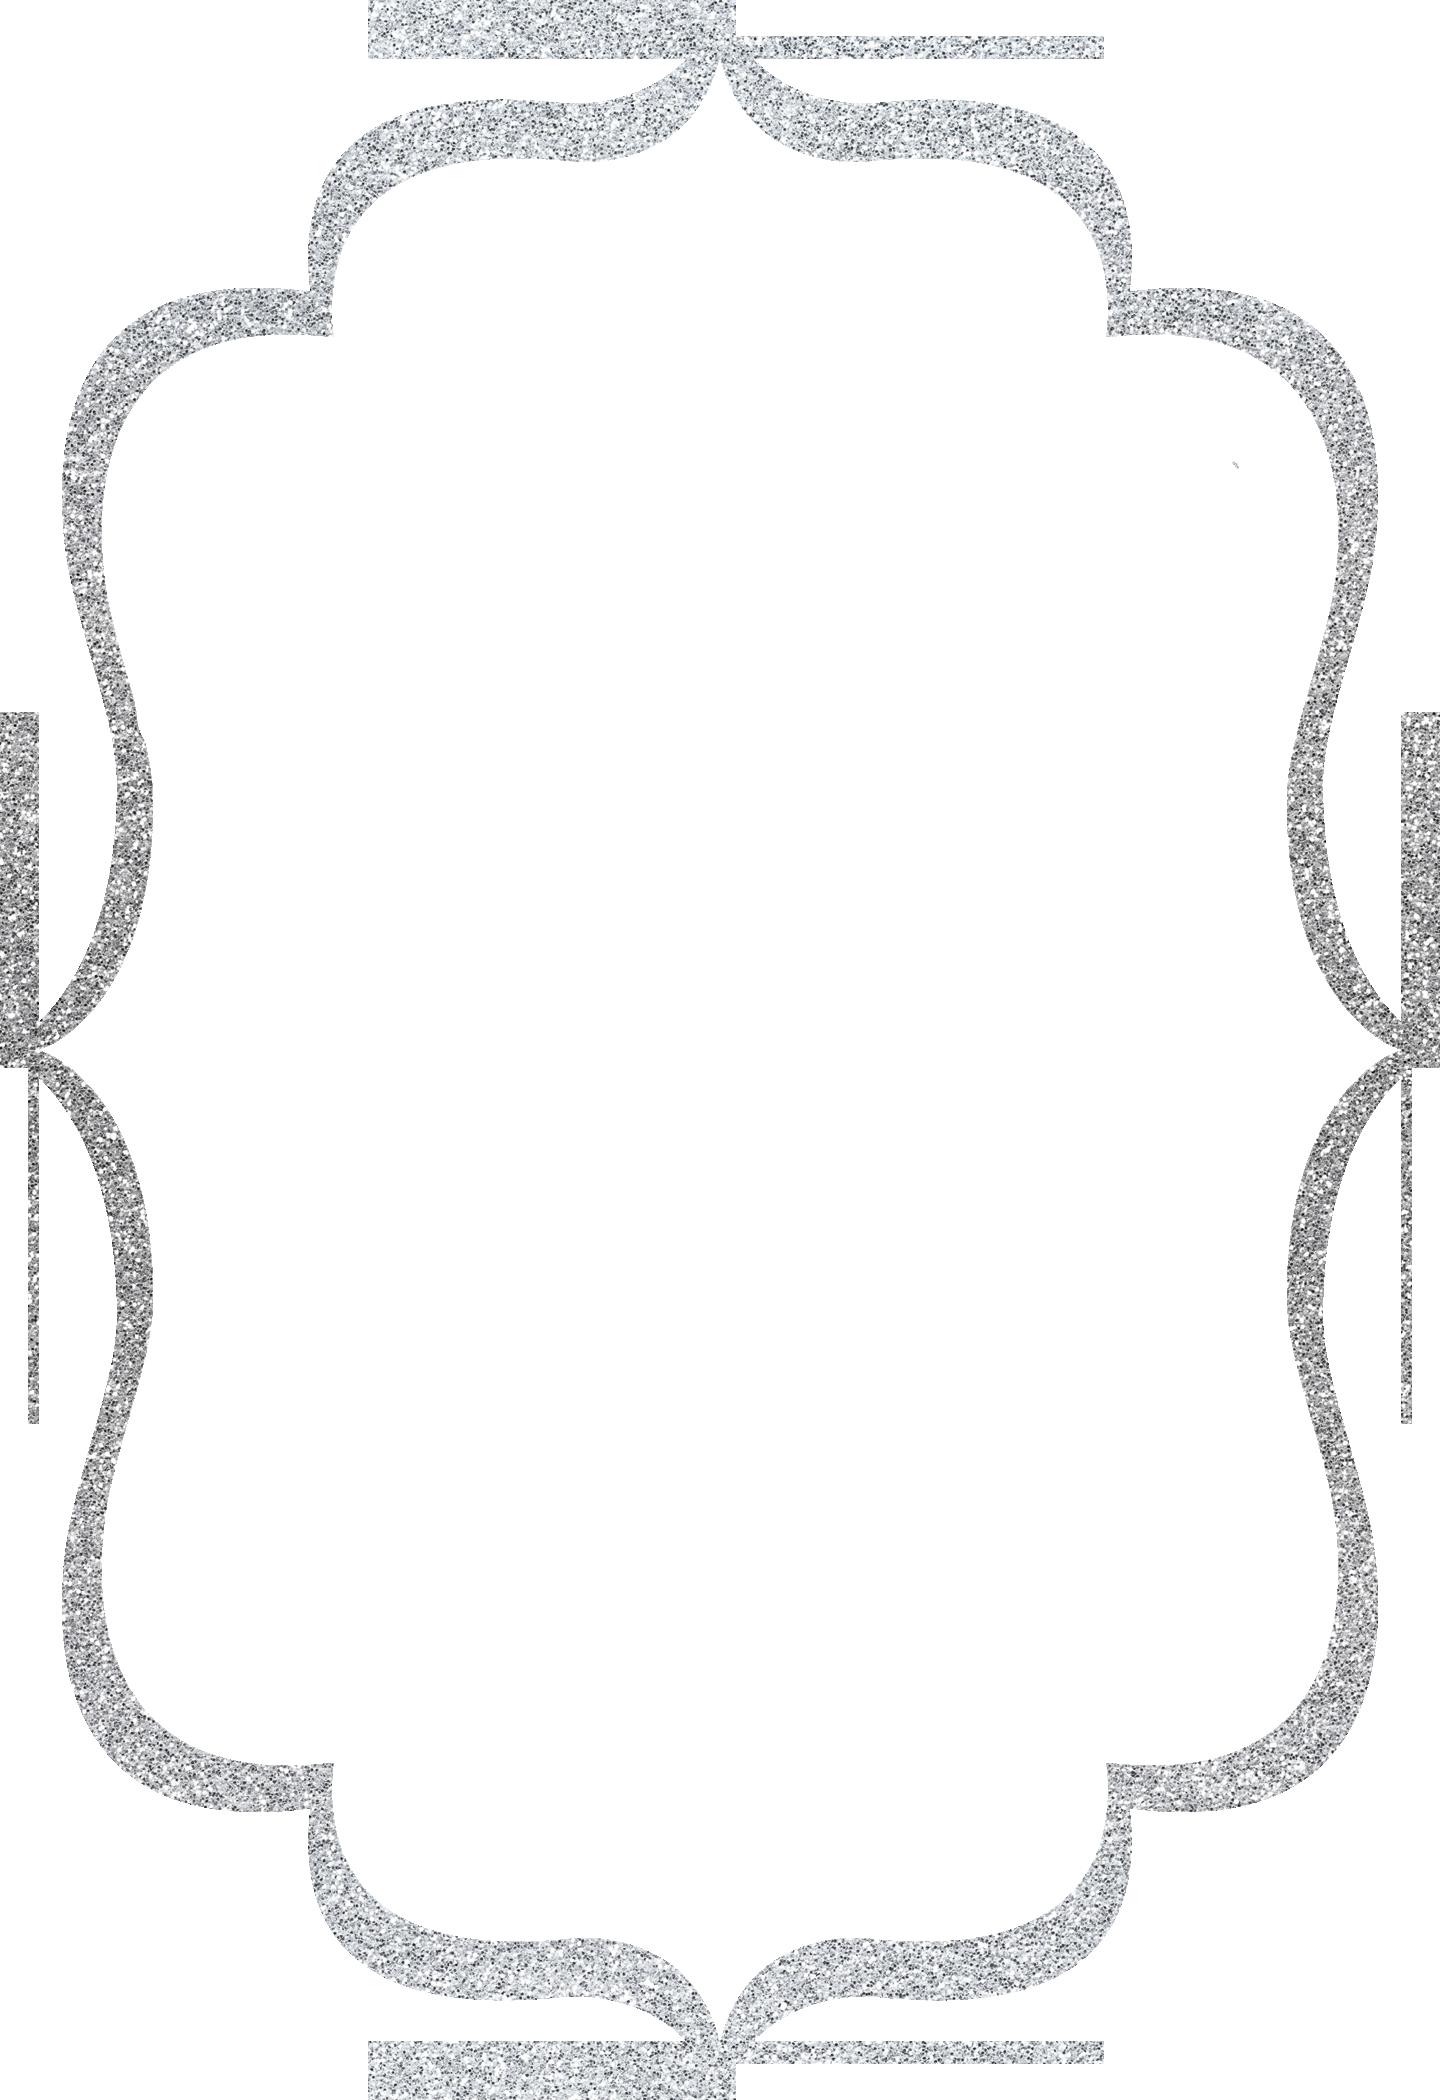 Bracket Frame Clipart Free Yellow Double Full Pagepng Clipart Free Clip Art Images Frame Clipart Free Clip Art Clip Art